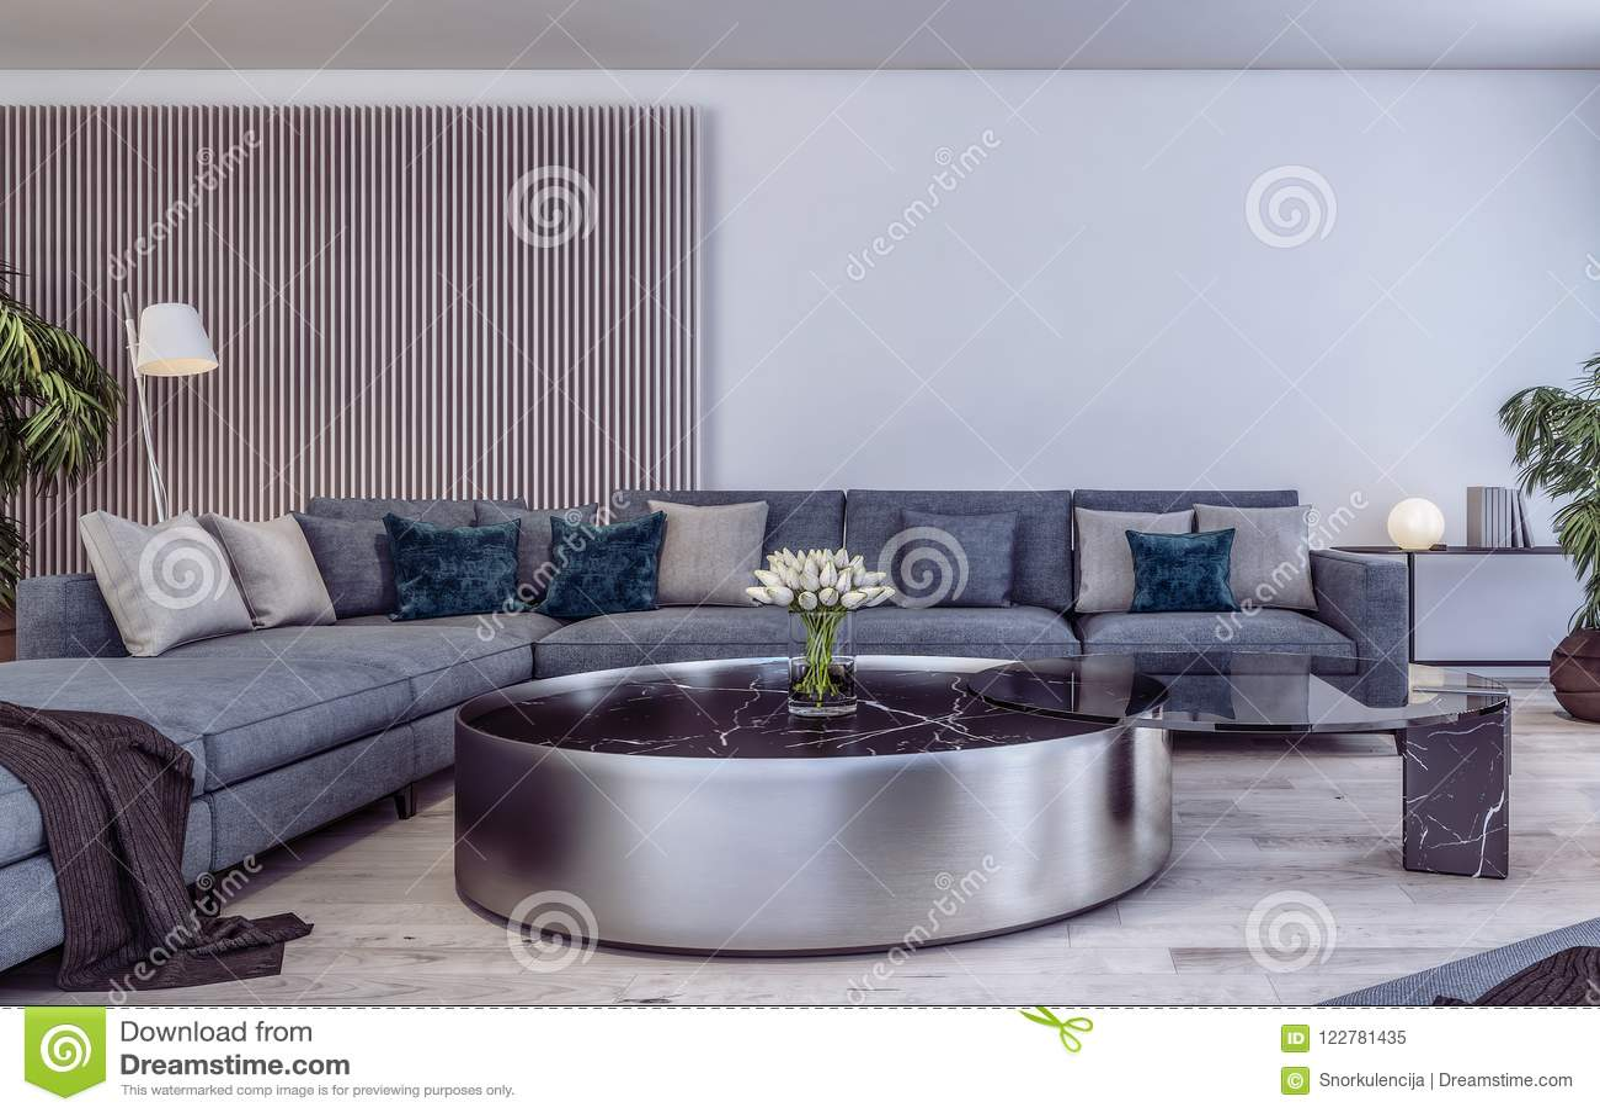 italian style living room furniture help decorate my modern interior design of stock